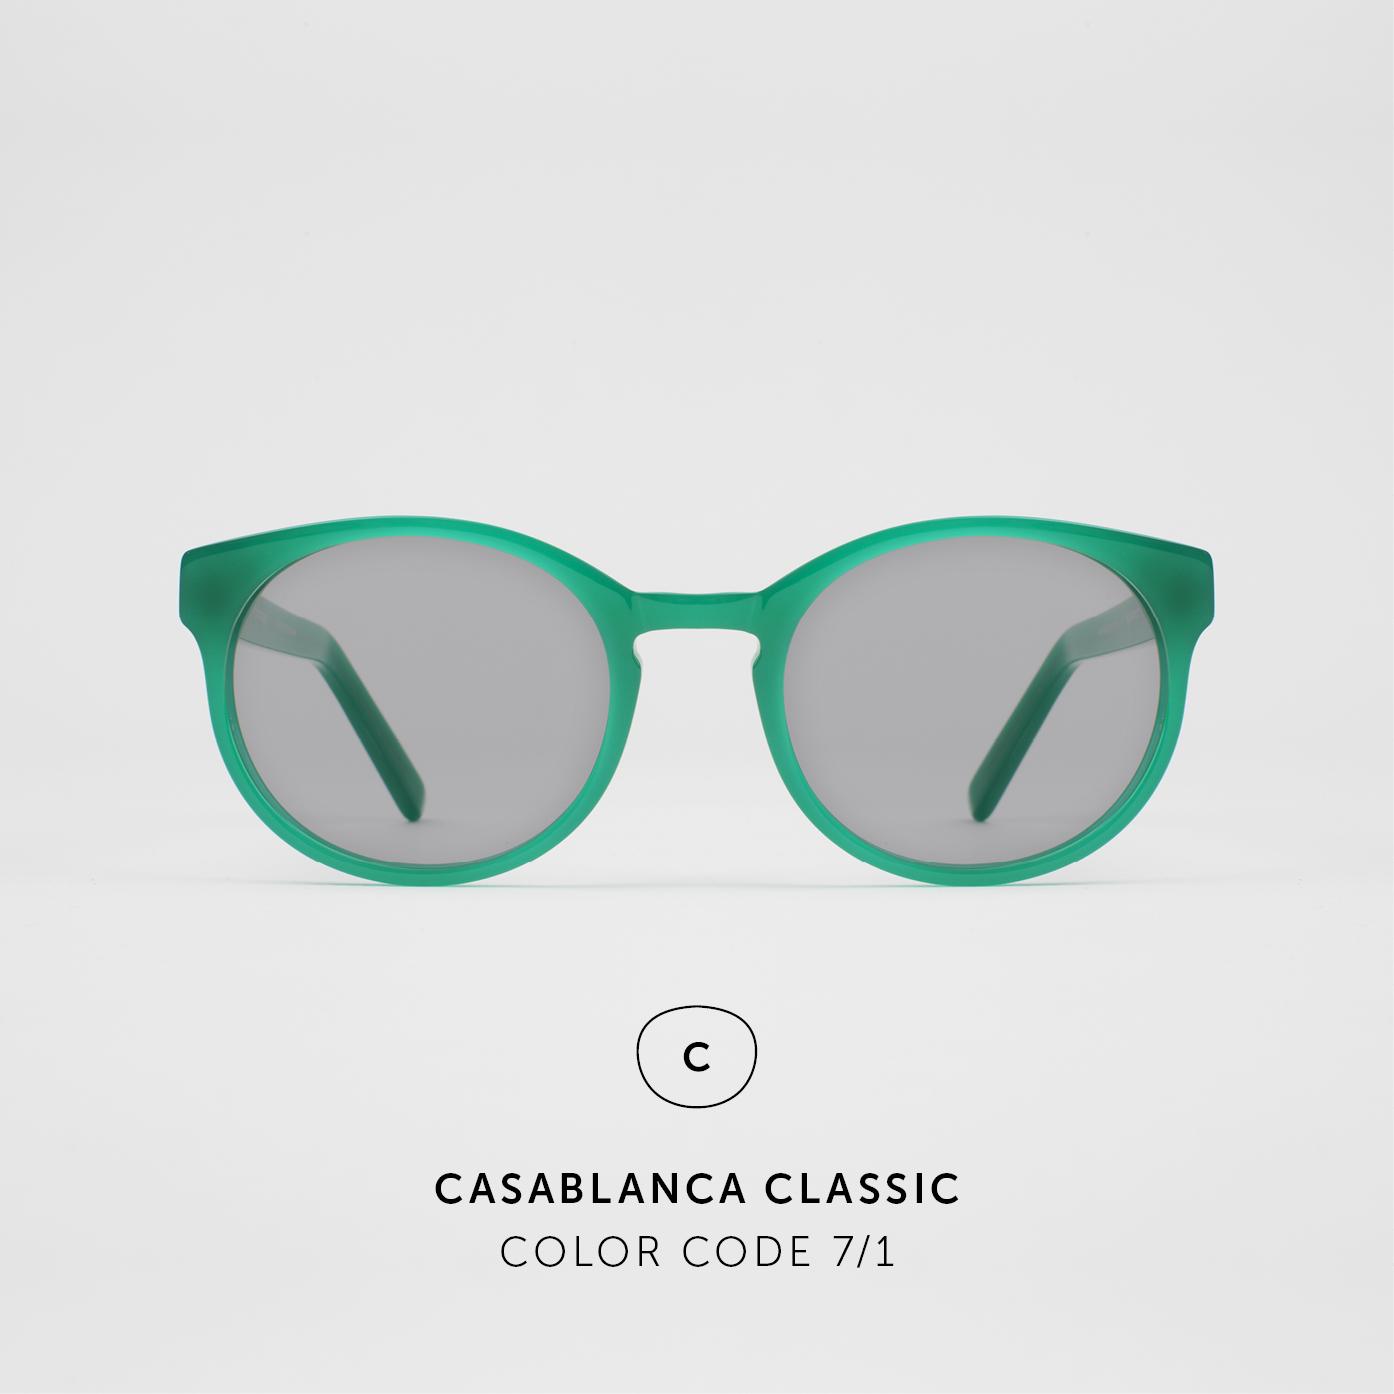 CasablancaClassic32.jpg